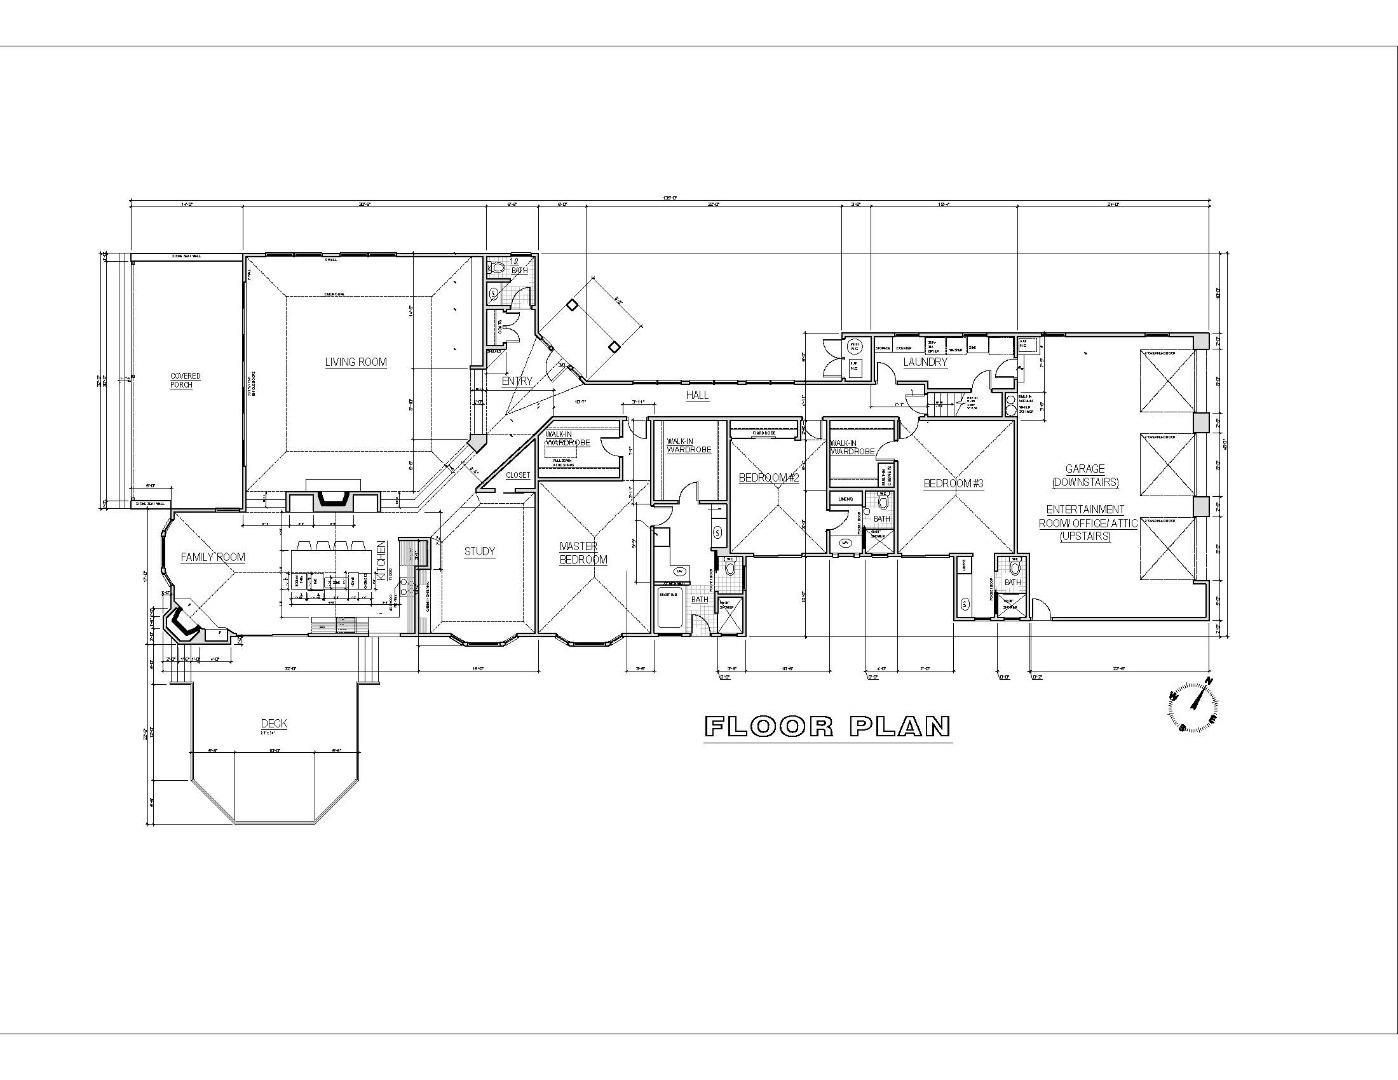 525 Shadowmere Way Aptos, CA 95003 - MLS #: ML81677331